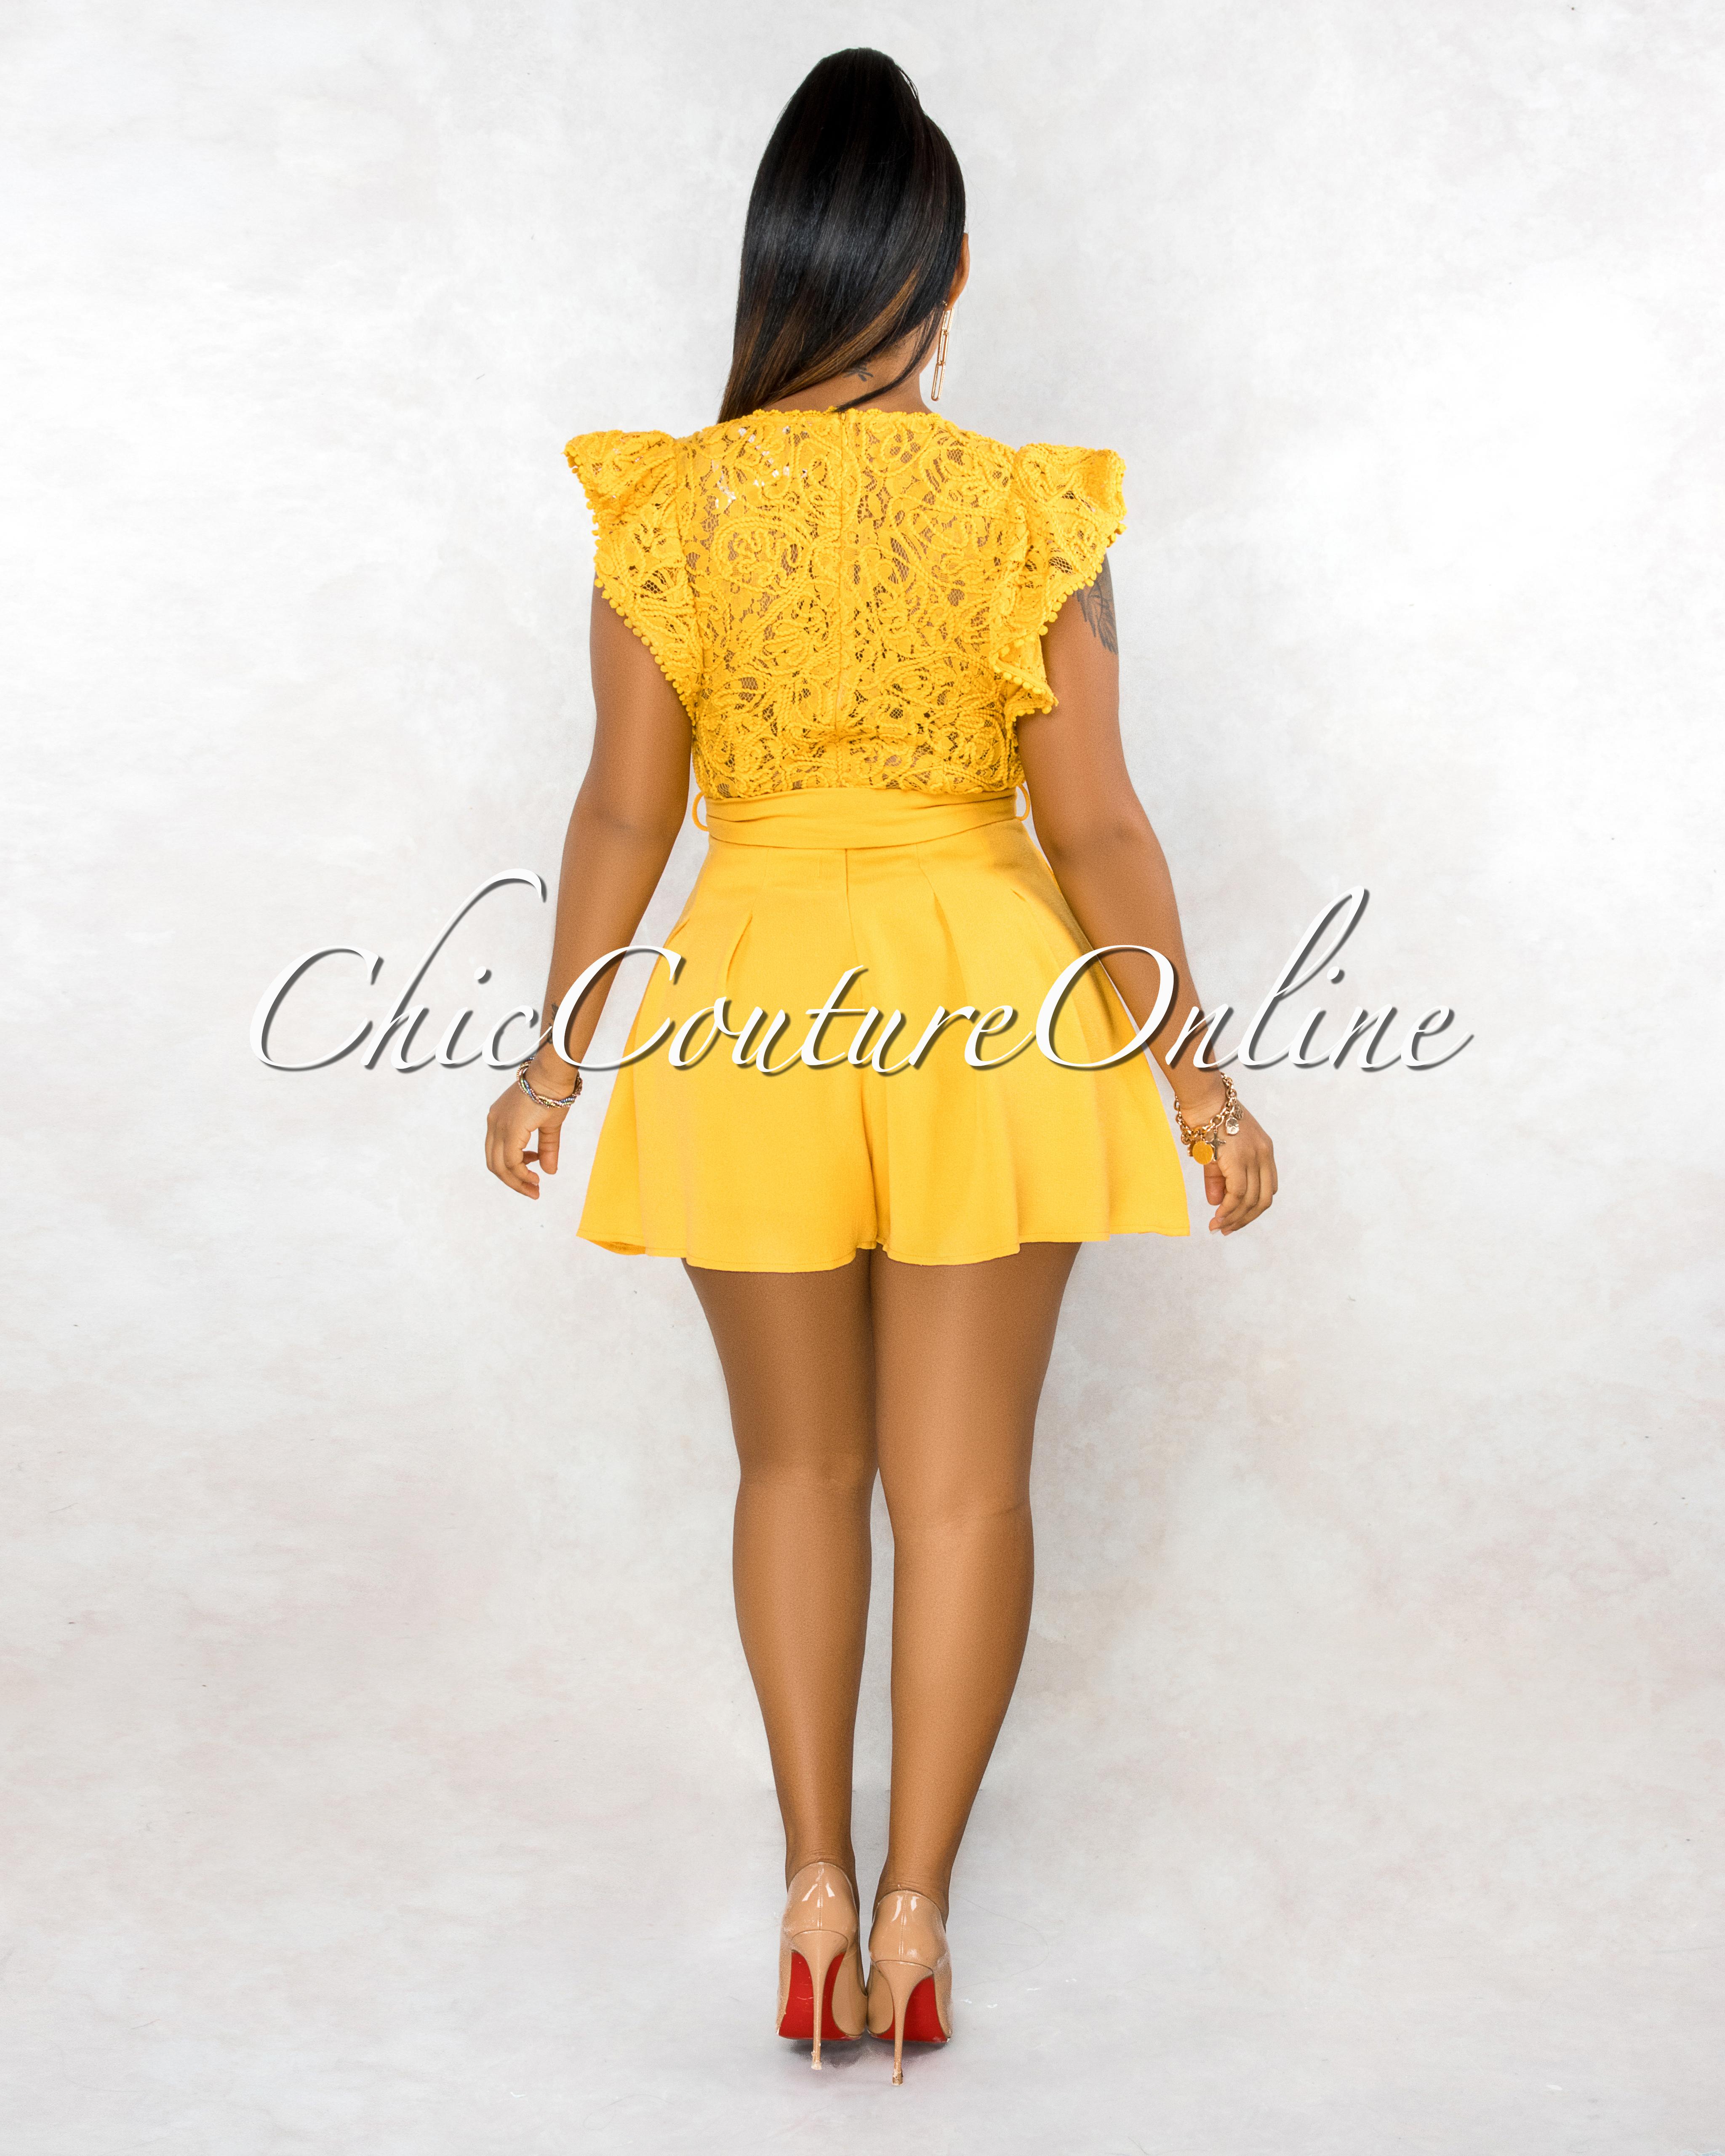 Sebastiana Mustard Yellow Embroidery Top Flutter Romper